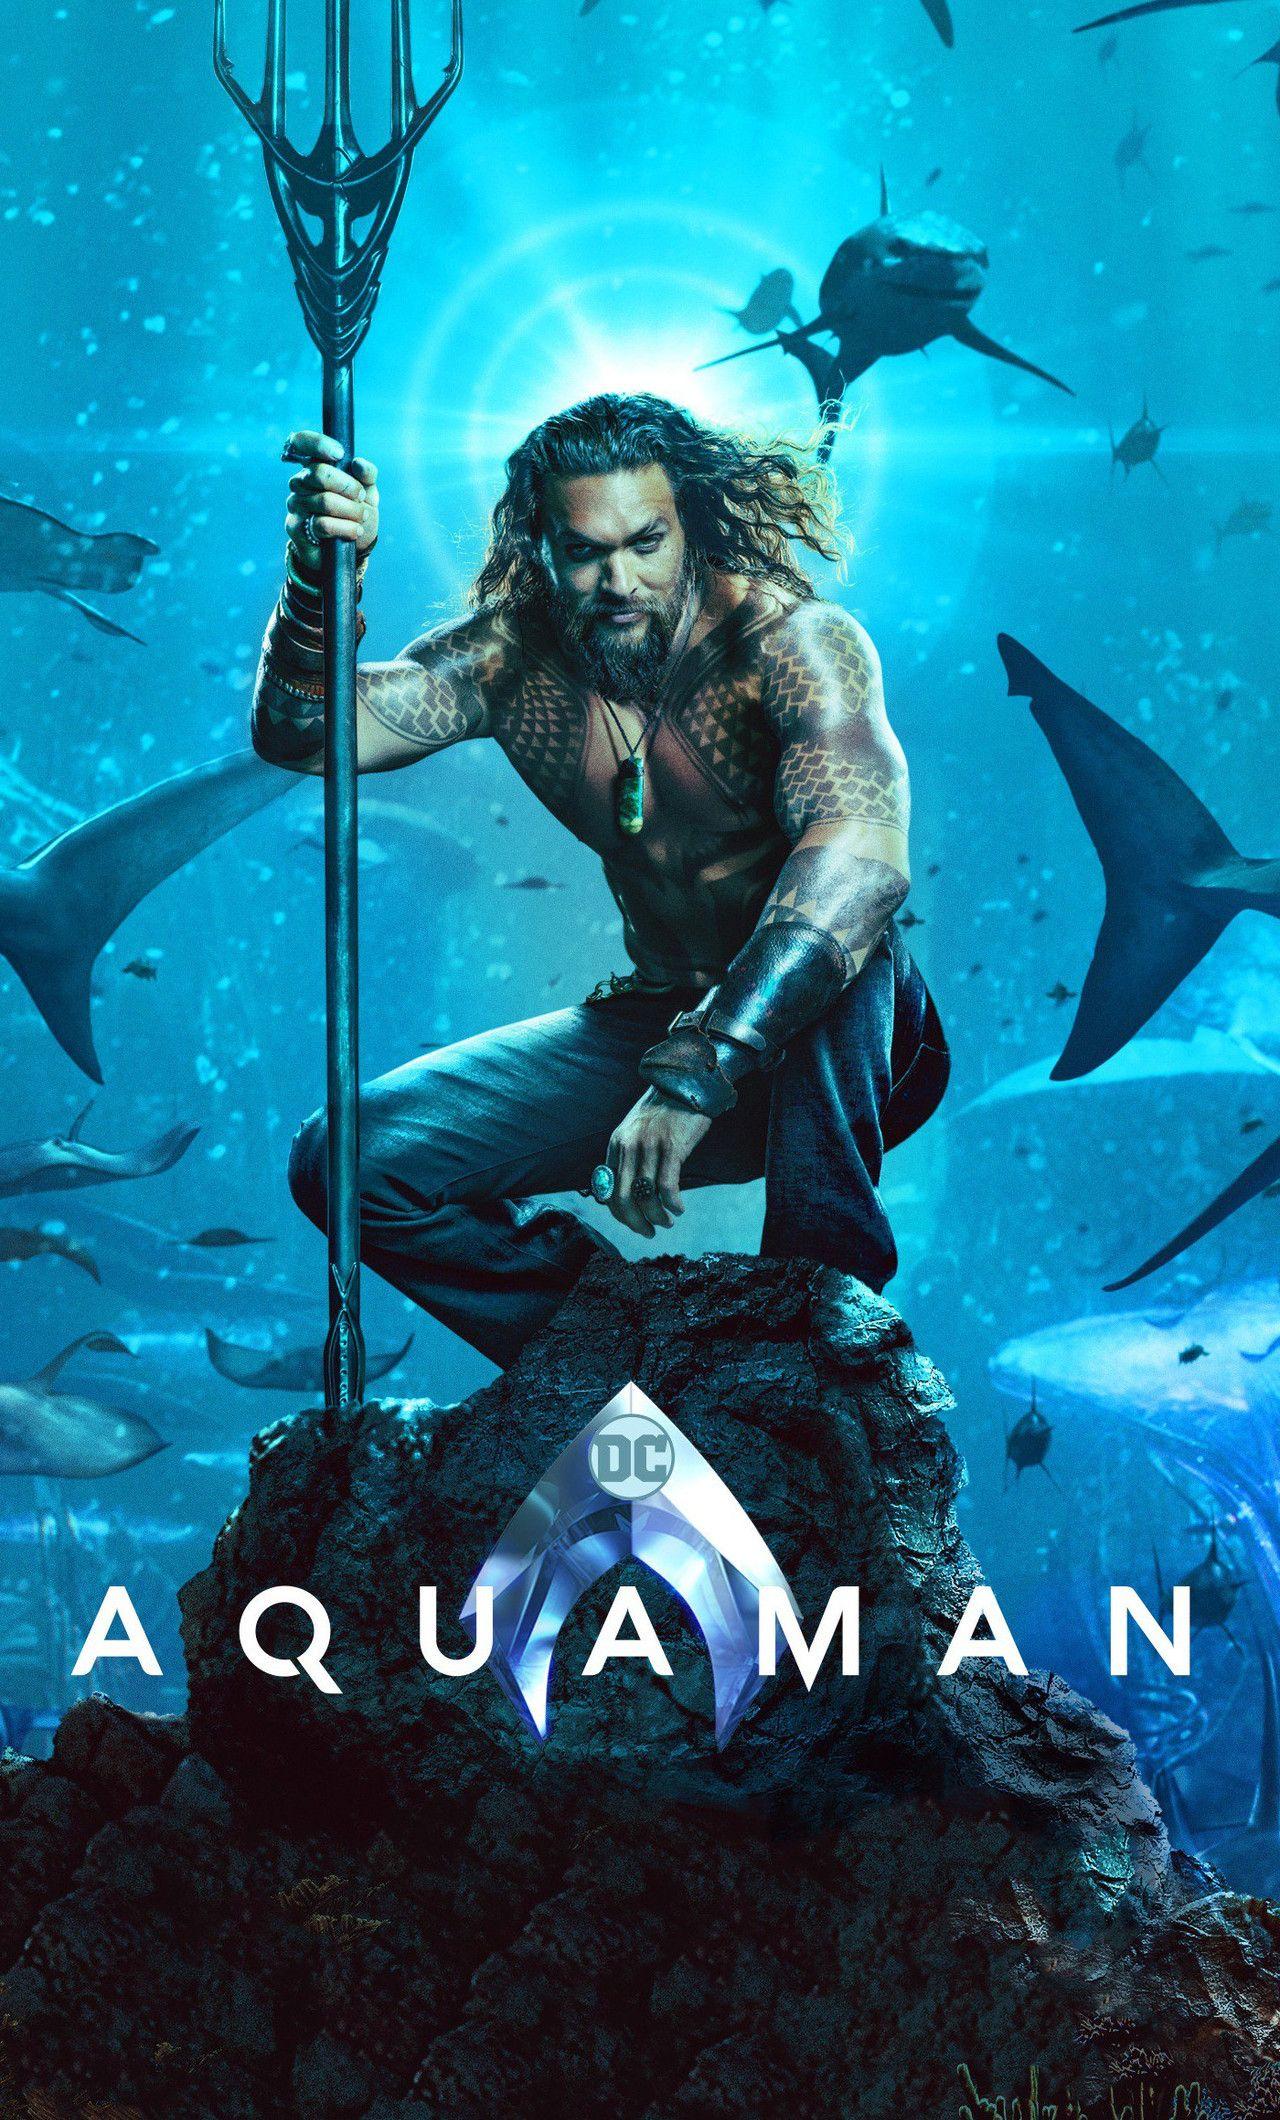 Aquaman Movie 4k In 1280x2120 Resolution Aquaman Film Aquaman Jason Momoa Aquaman